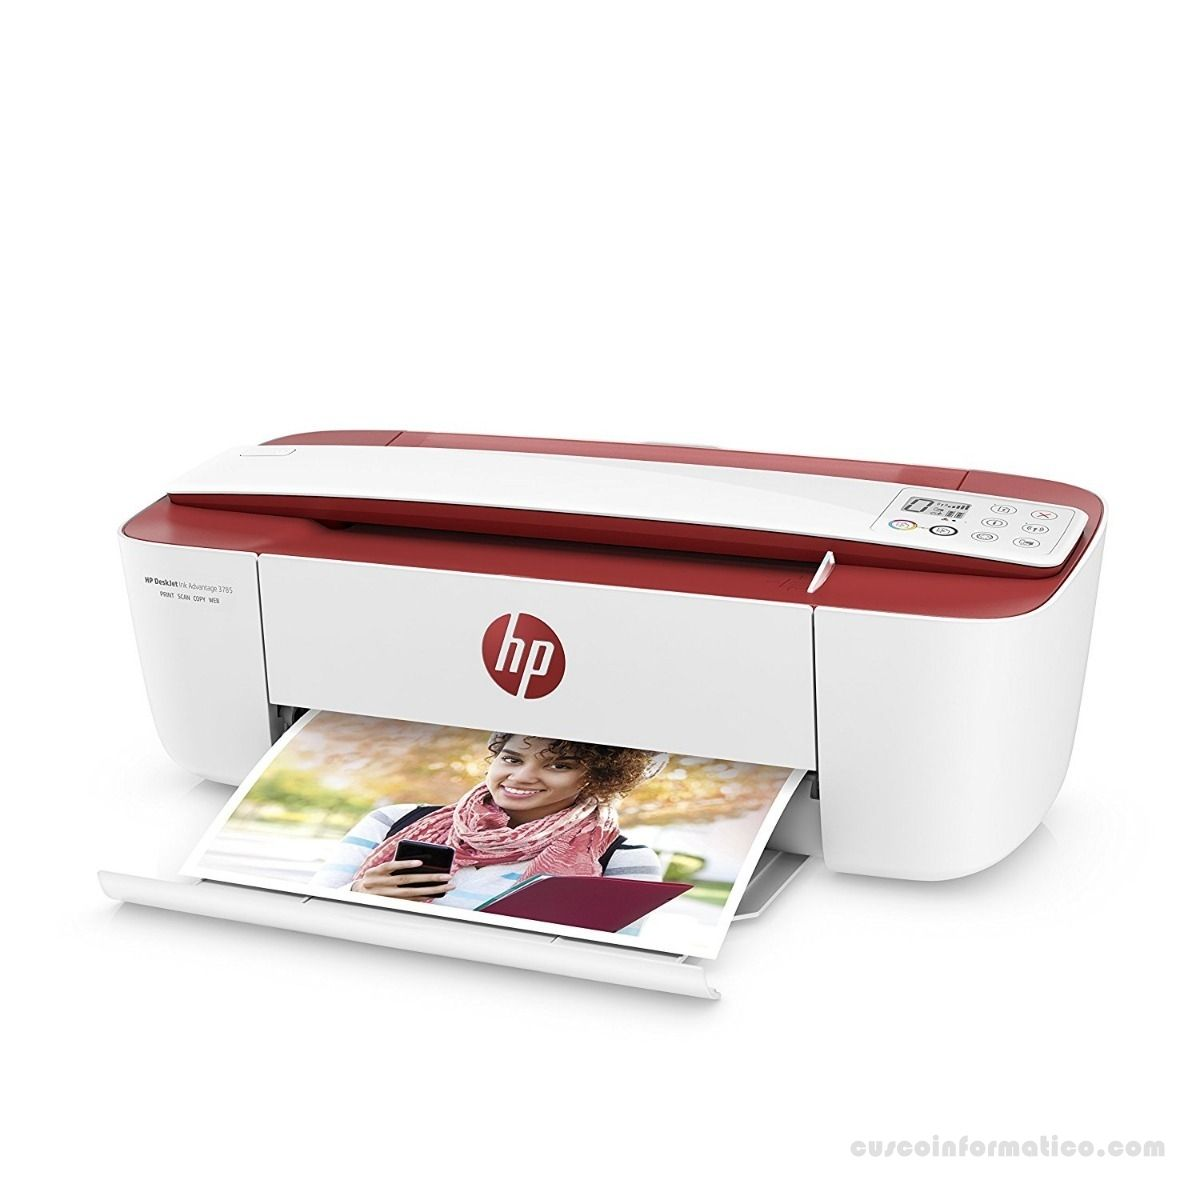 Impresora Multifuncional de tinta HP DeskJet Ink Advantage 3785, Imprime/Escáner/Copia/ USB/Wi-Fi